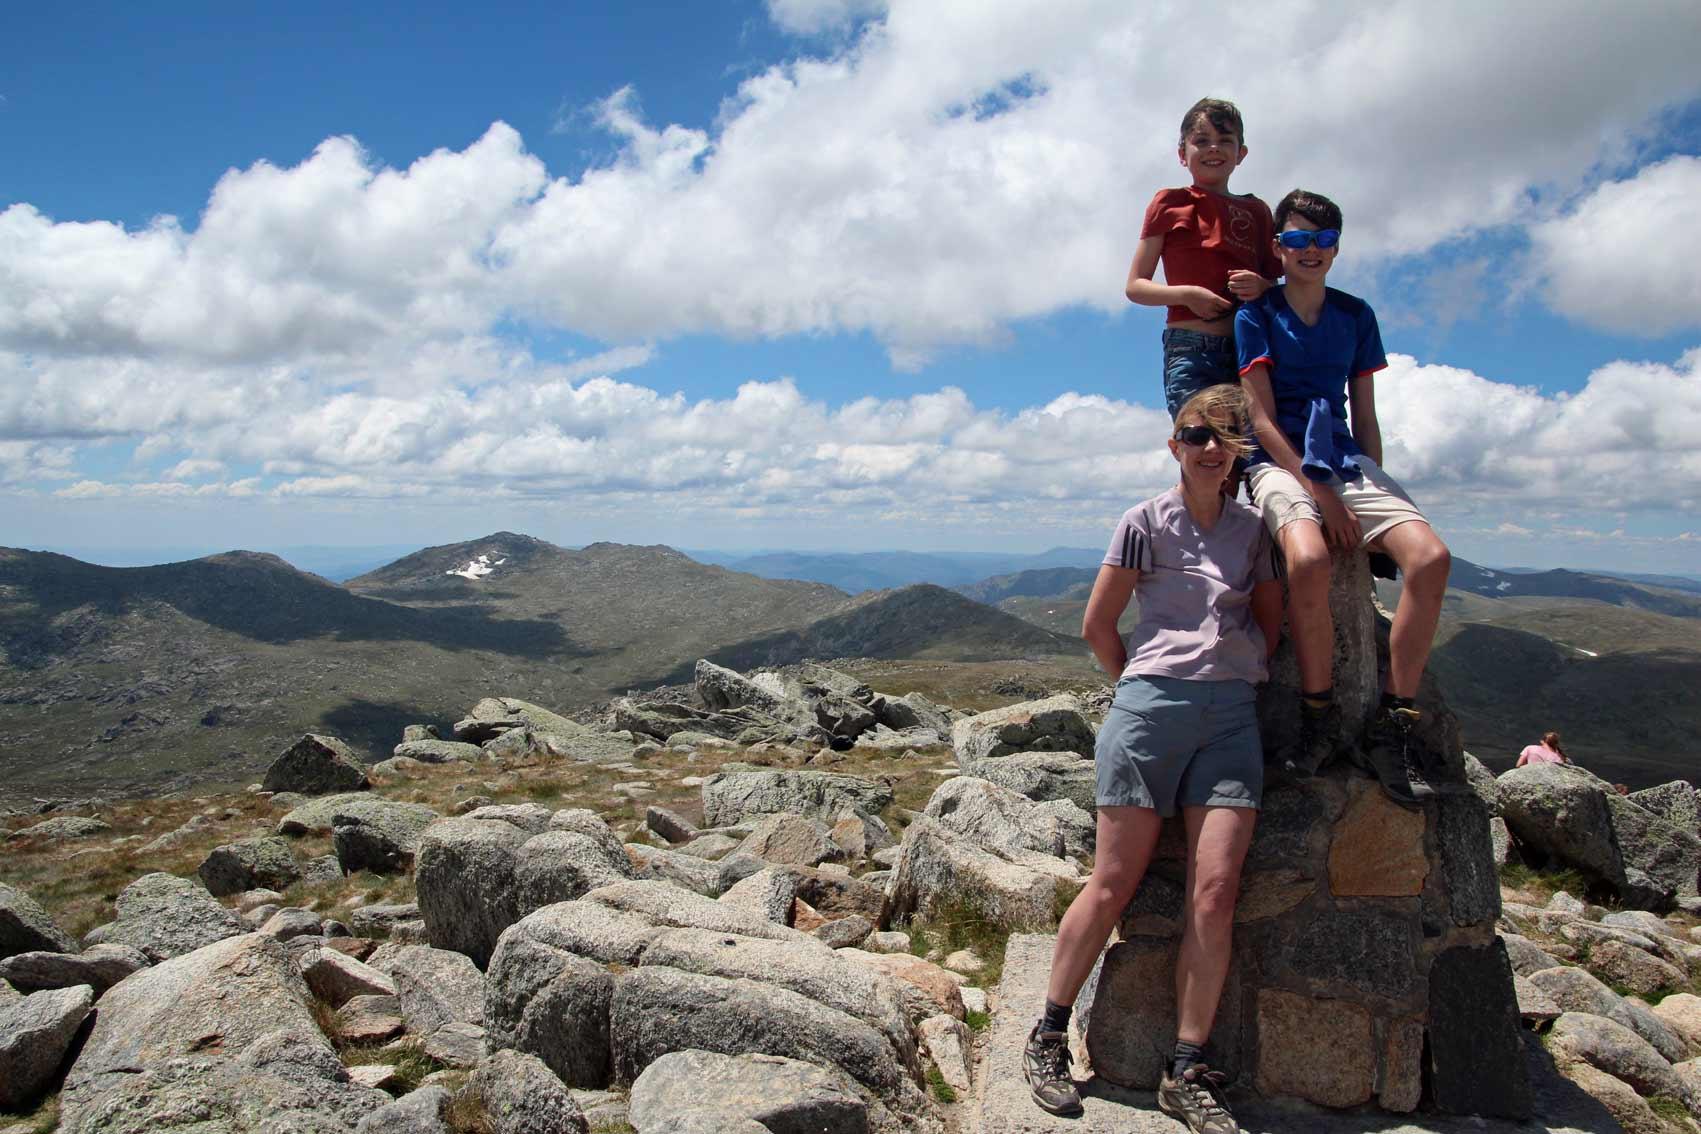 Sunlover Holidays: Top 5 hikes and walks in Australia |Hiking Australia